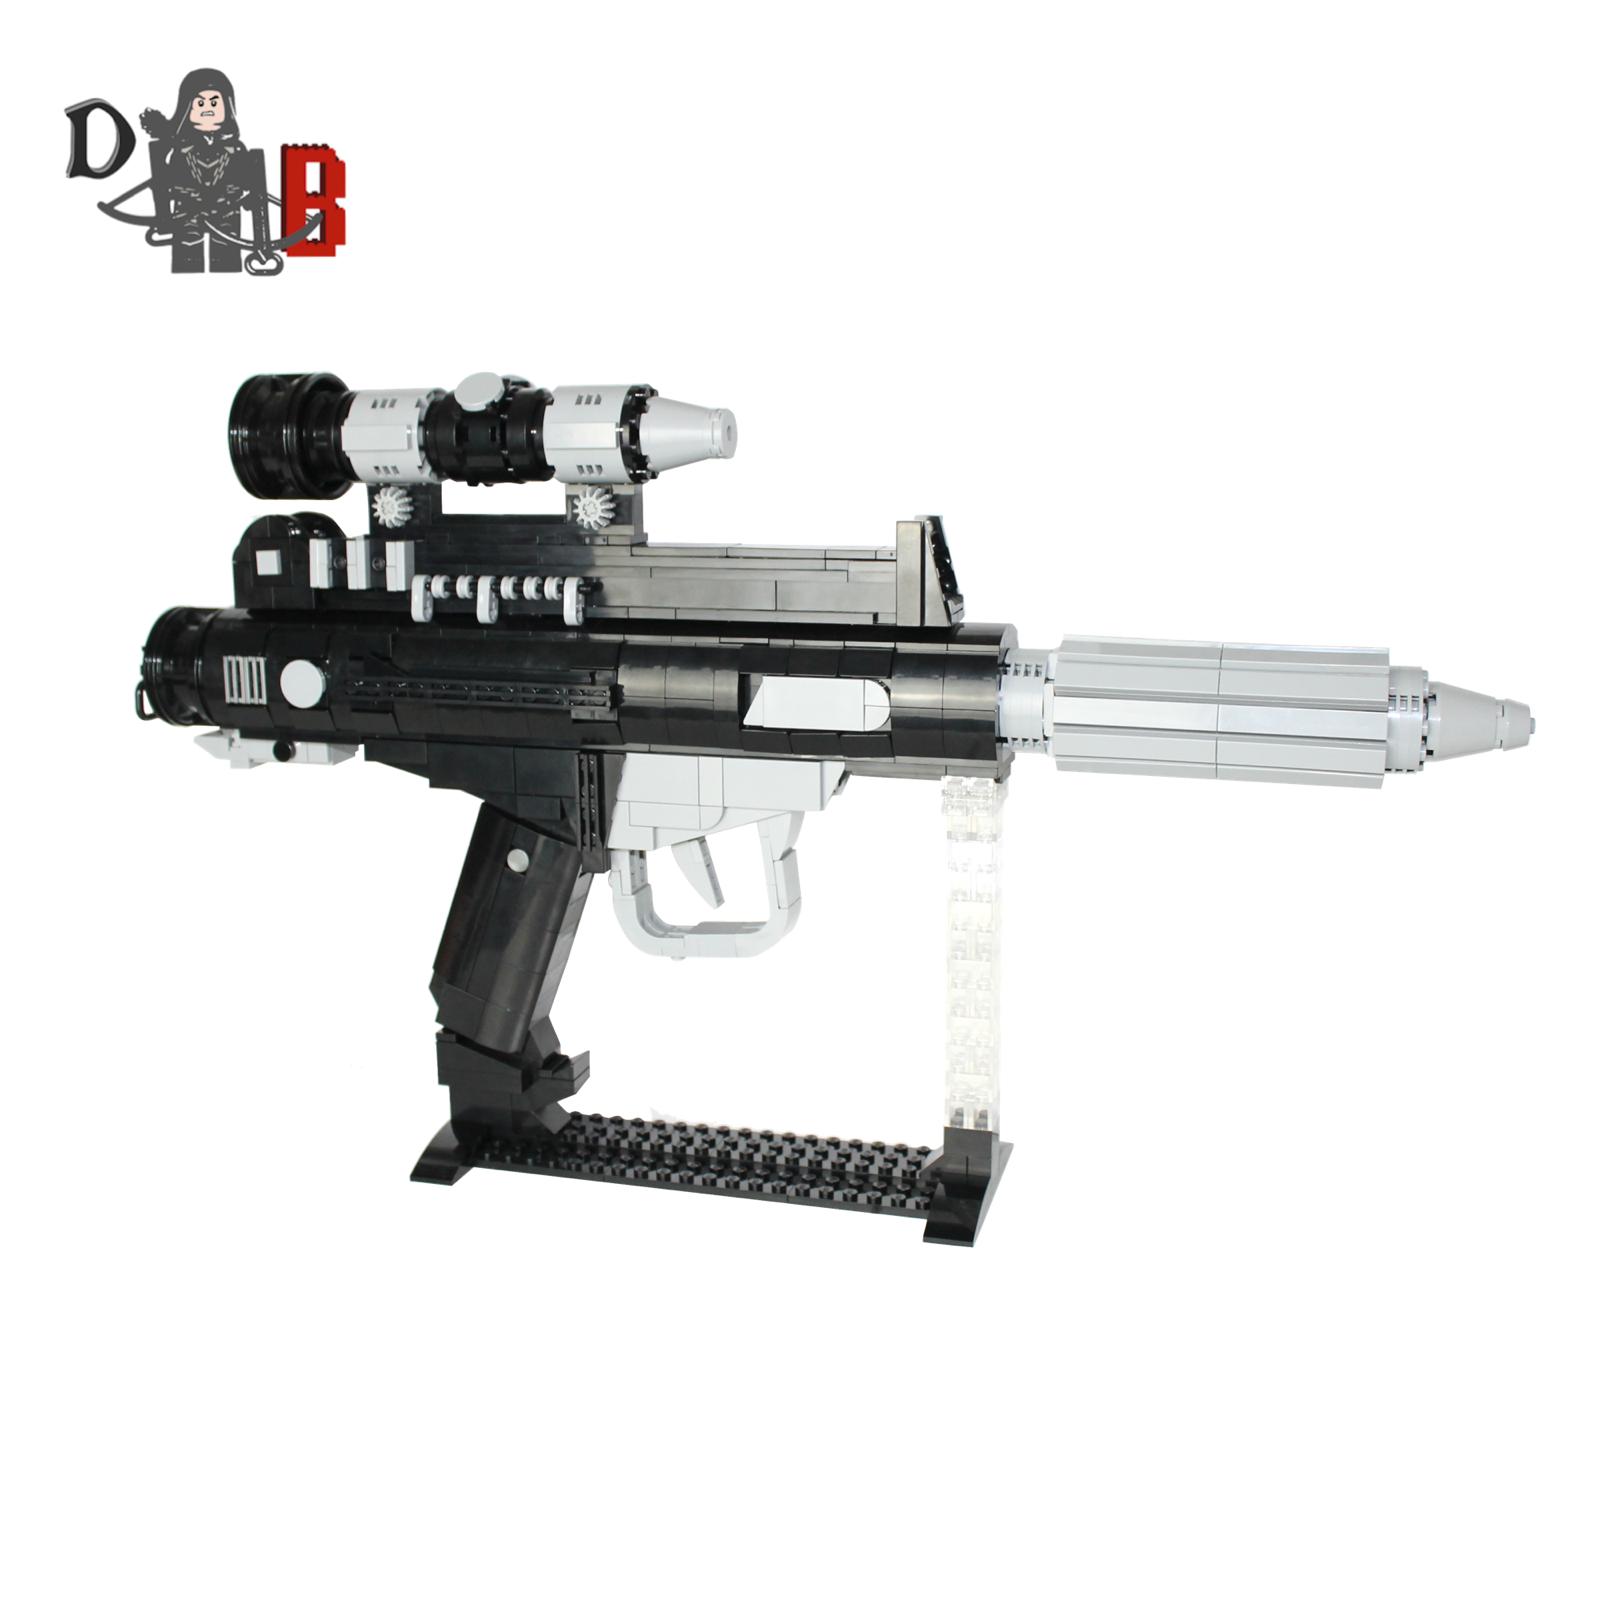 Star Wars Custom Custom Custom DH-17 Battlefront Rebel Blaster Pistolet fabriqué au moyen de Lego pièces c4d228